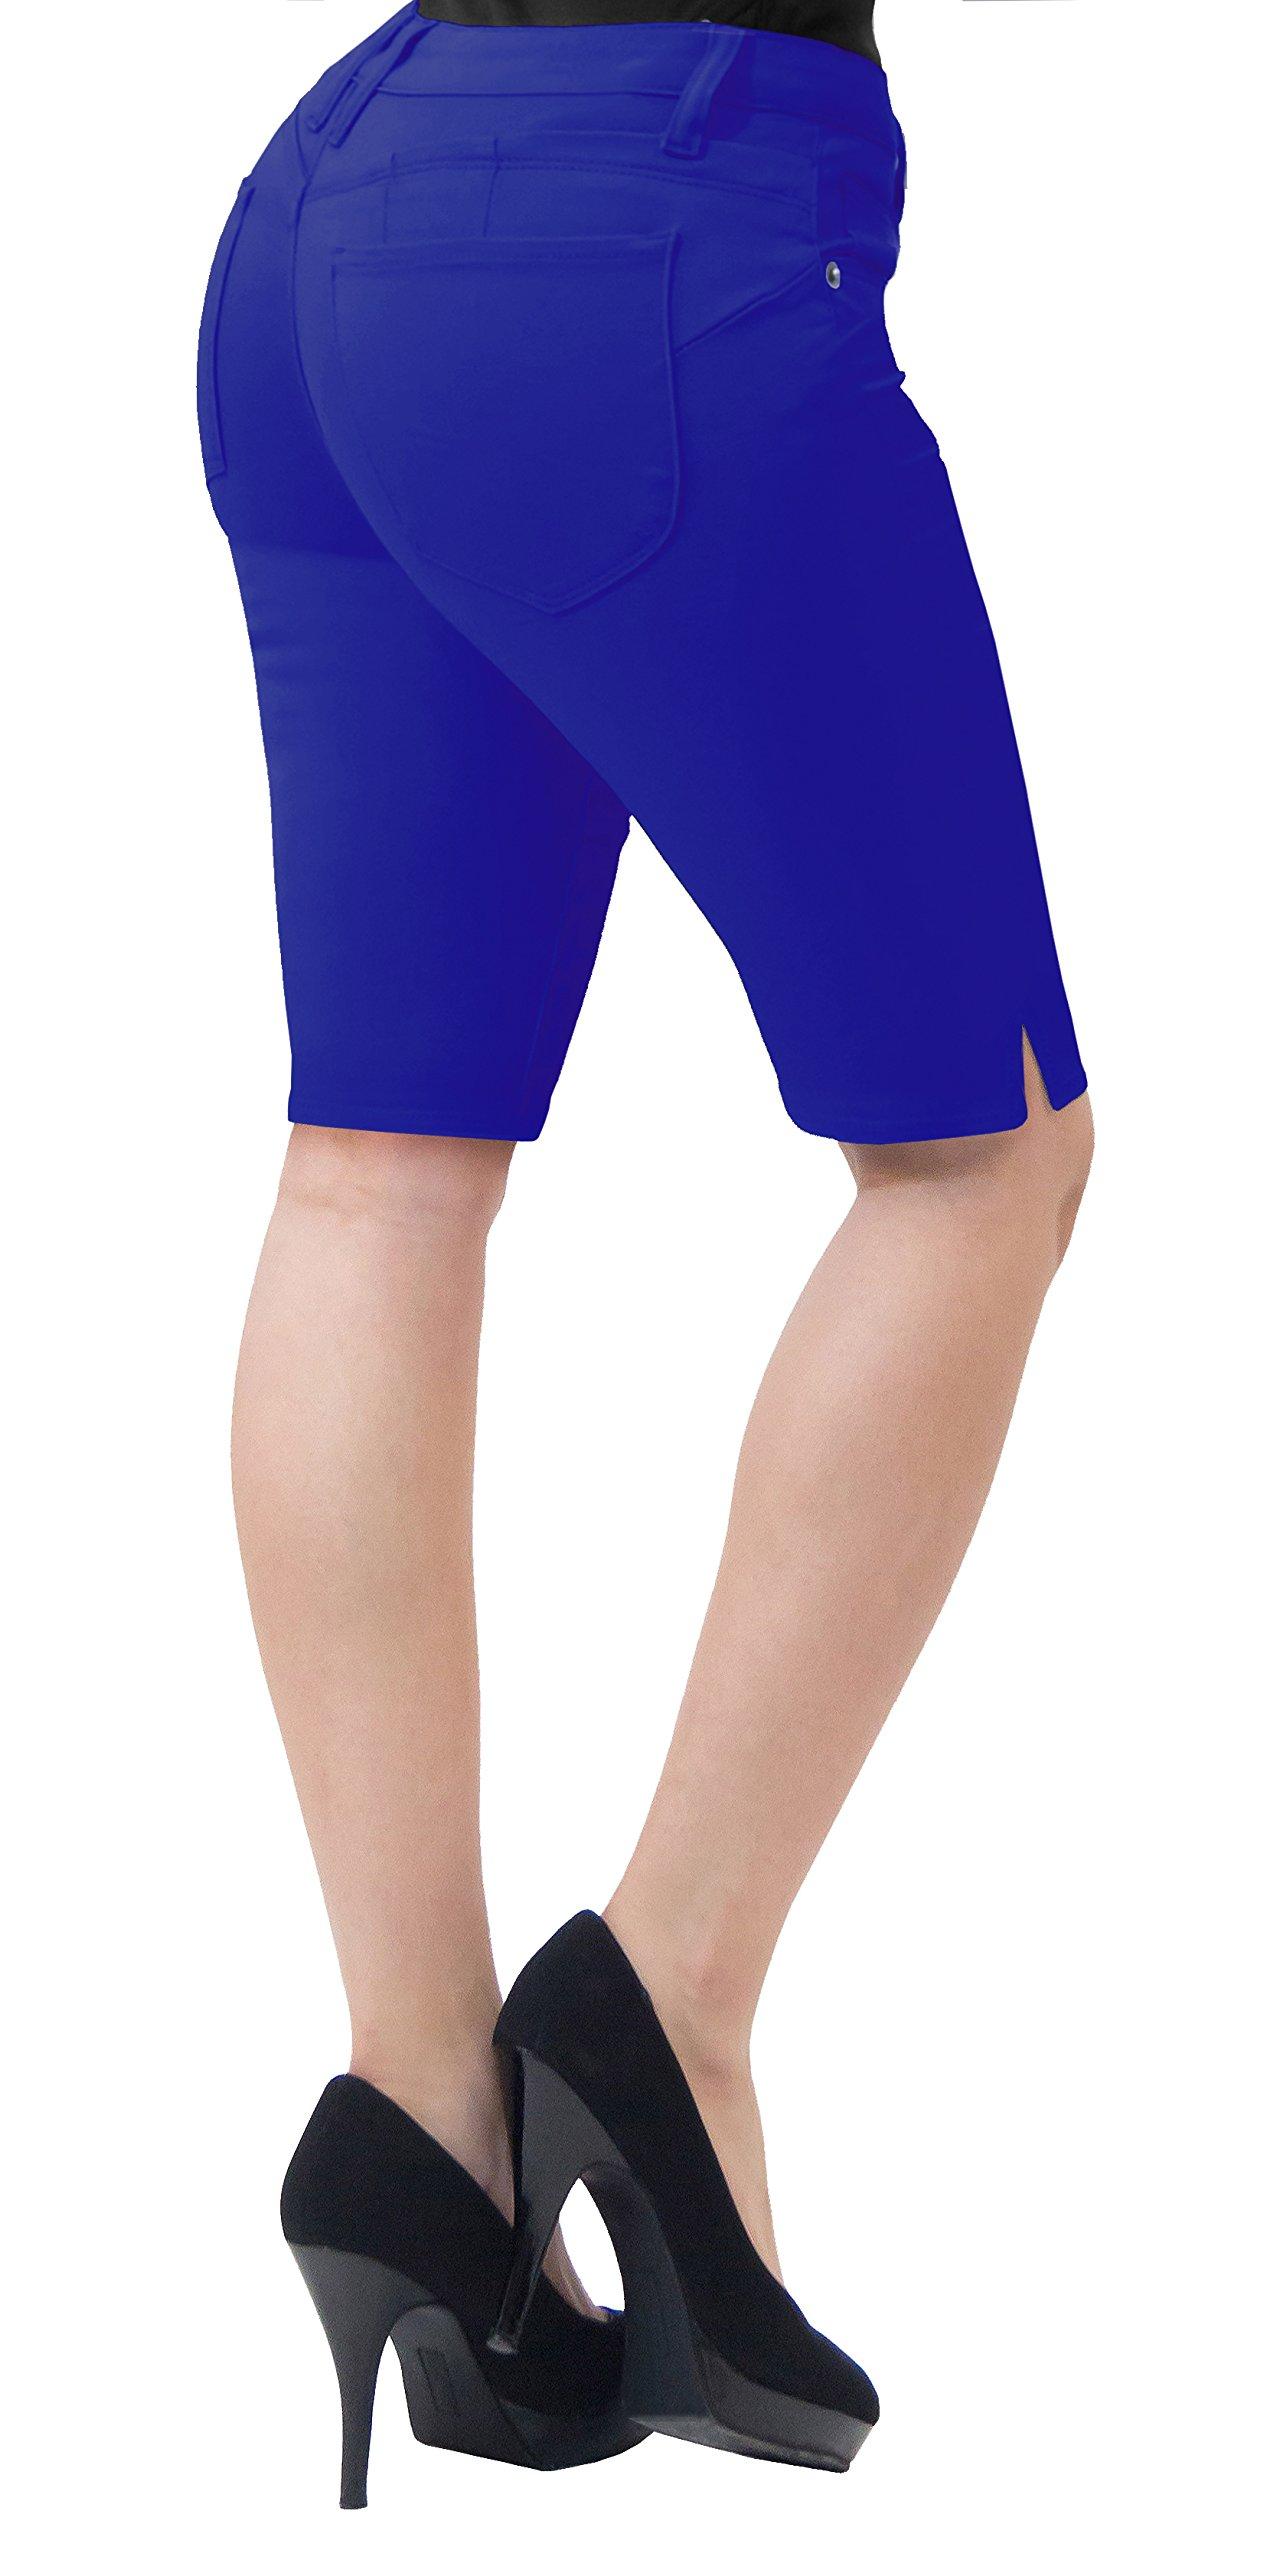 HyBrid & Company Super Comfy Stretch Bermuda Shorts B43308 Royal 5